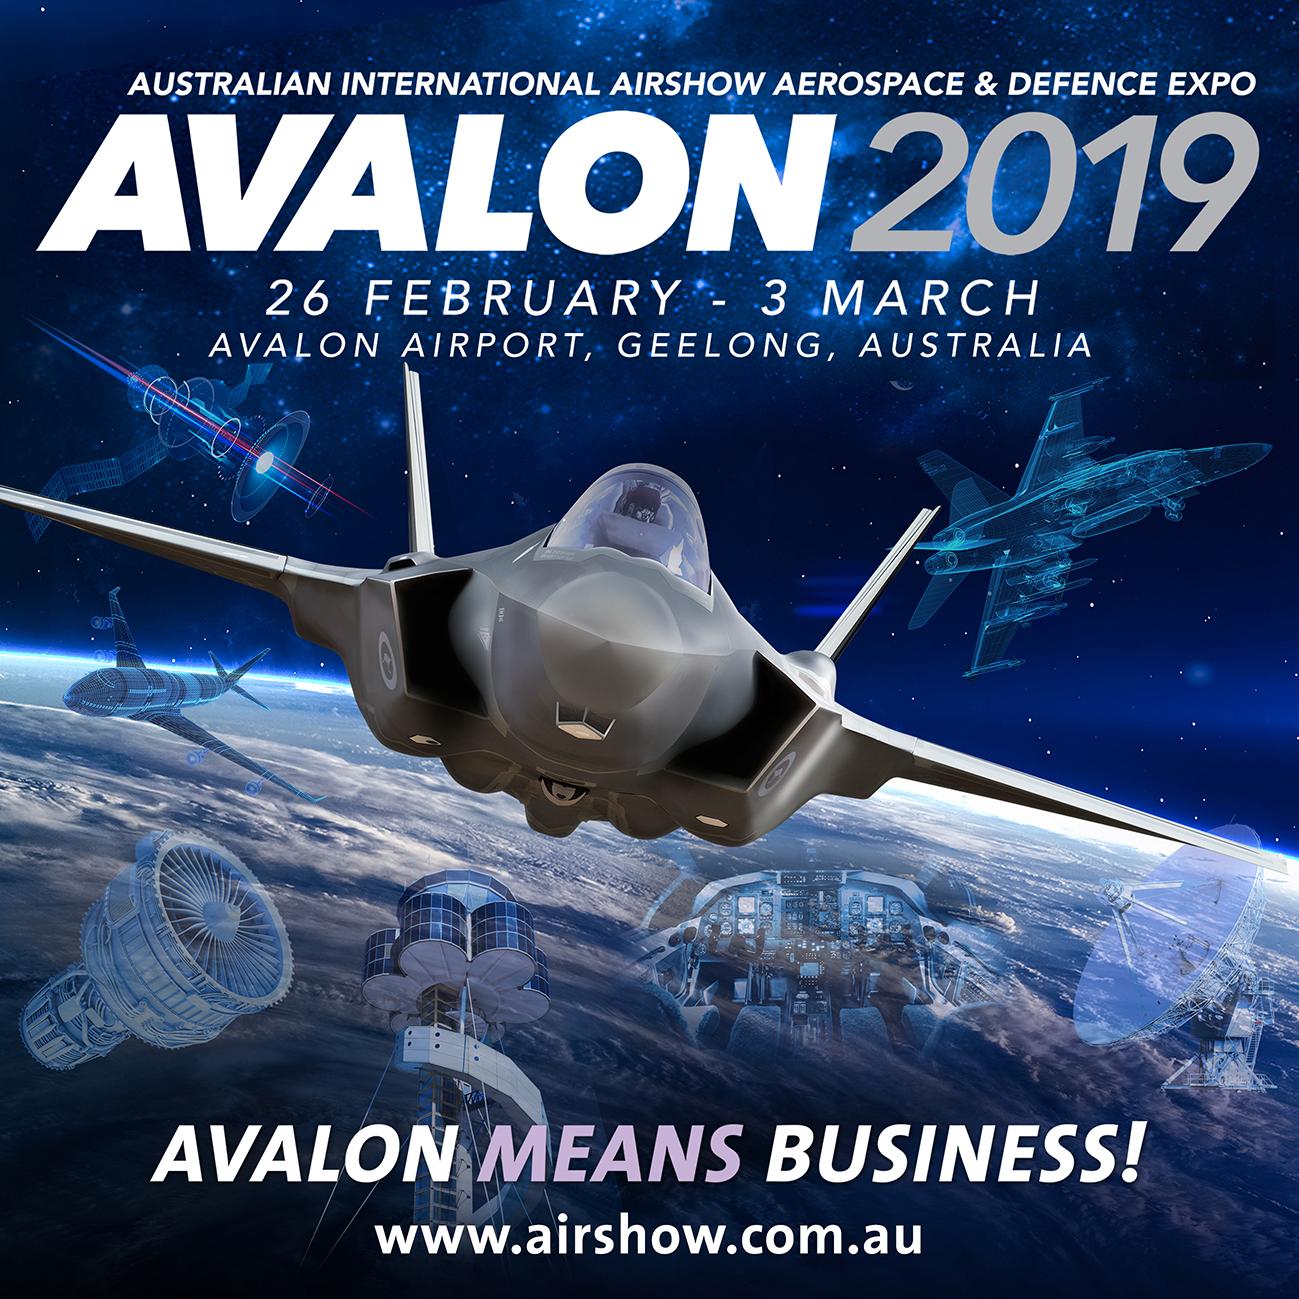 AVALON 2019 - The Australian International Airshow